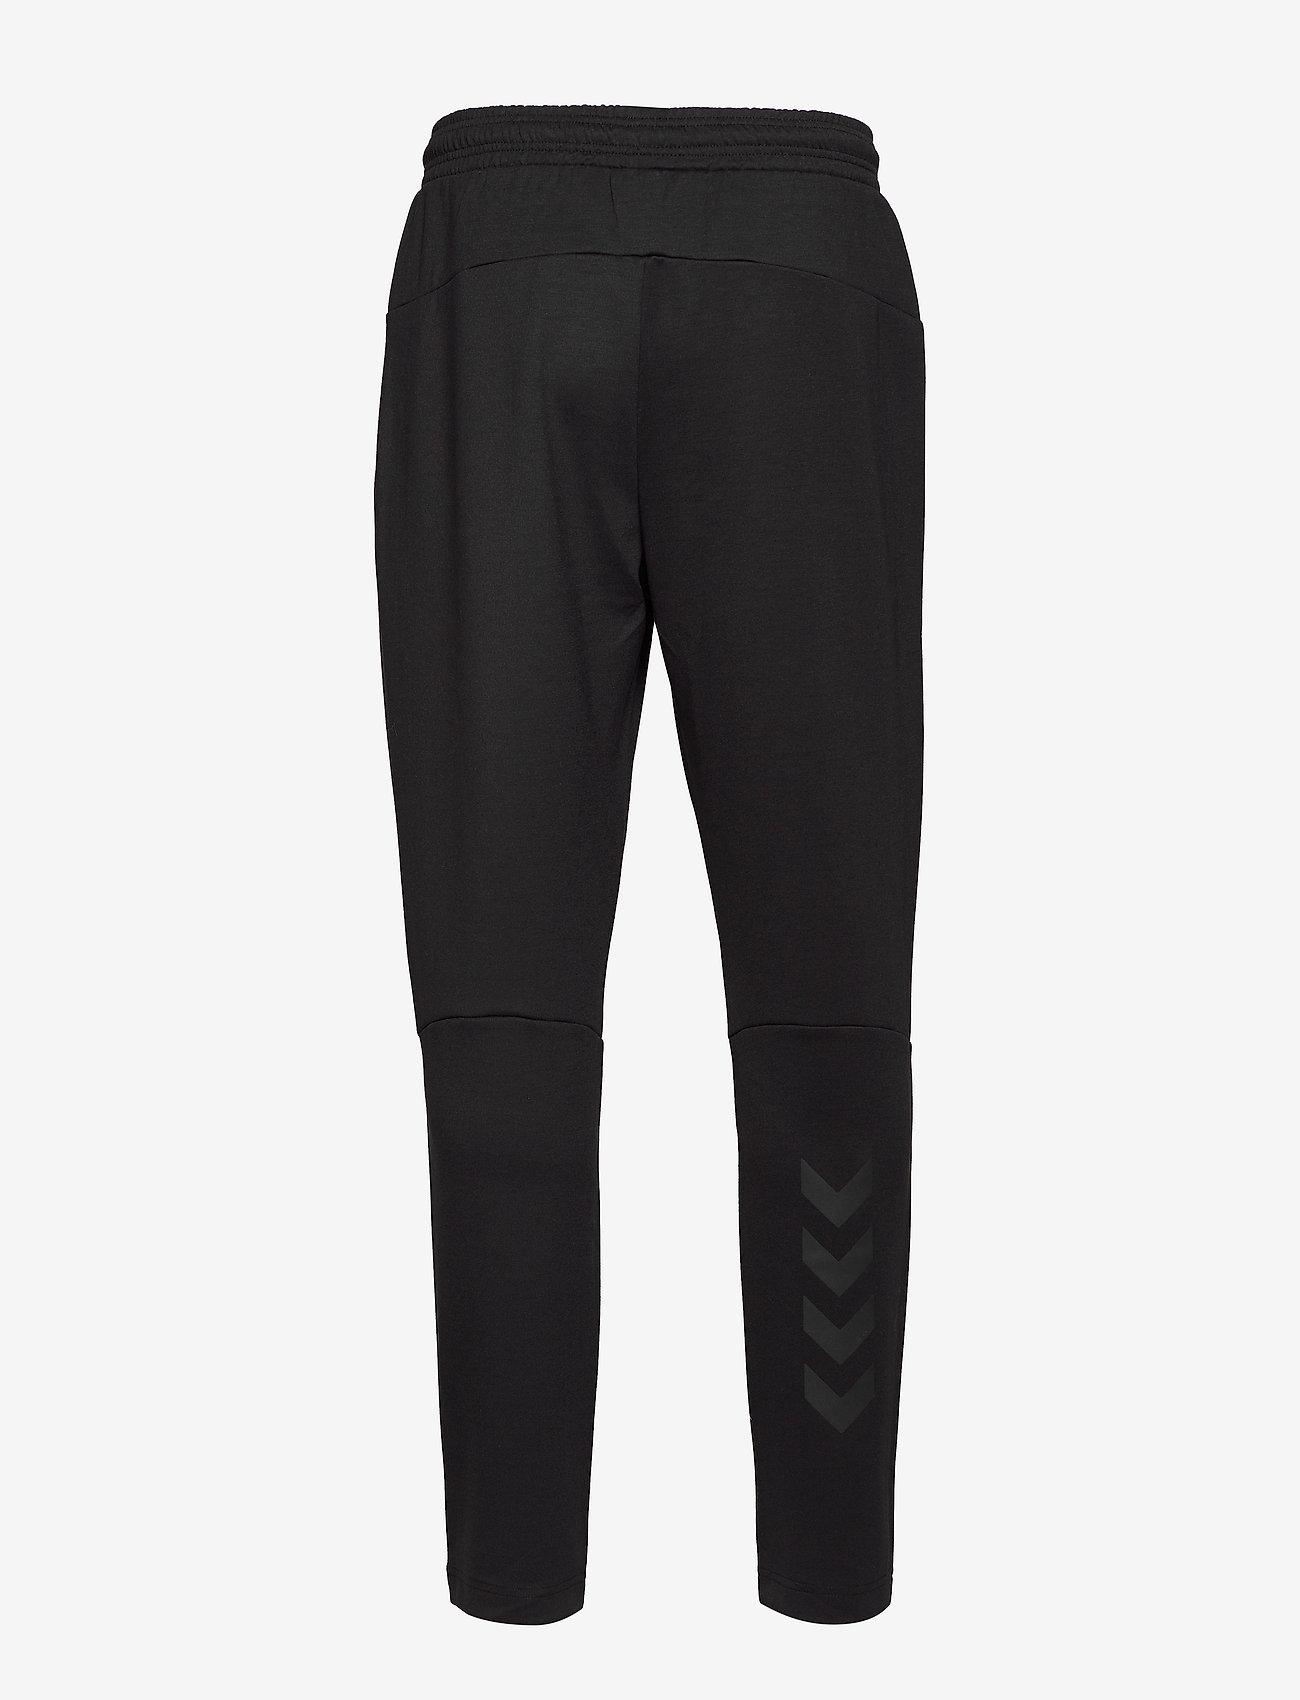 Hummel - hmlTROPPER TAPERED PANTS - pants - black - 1